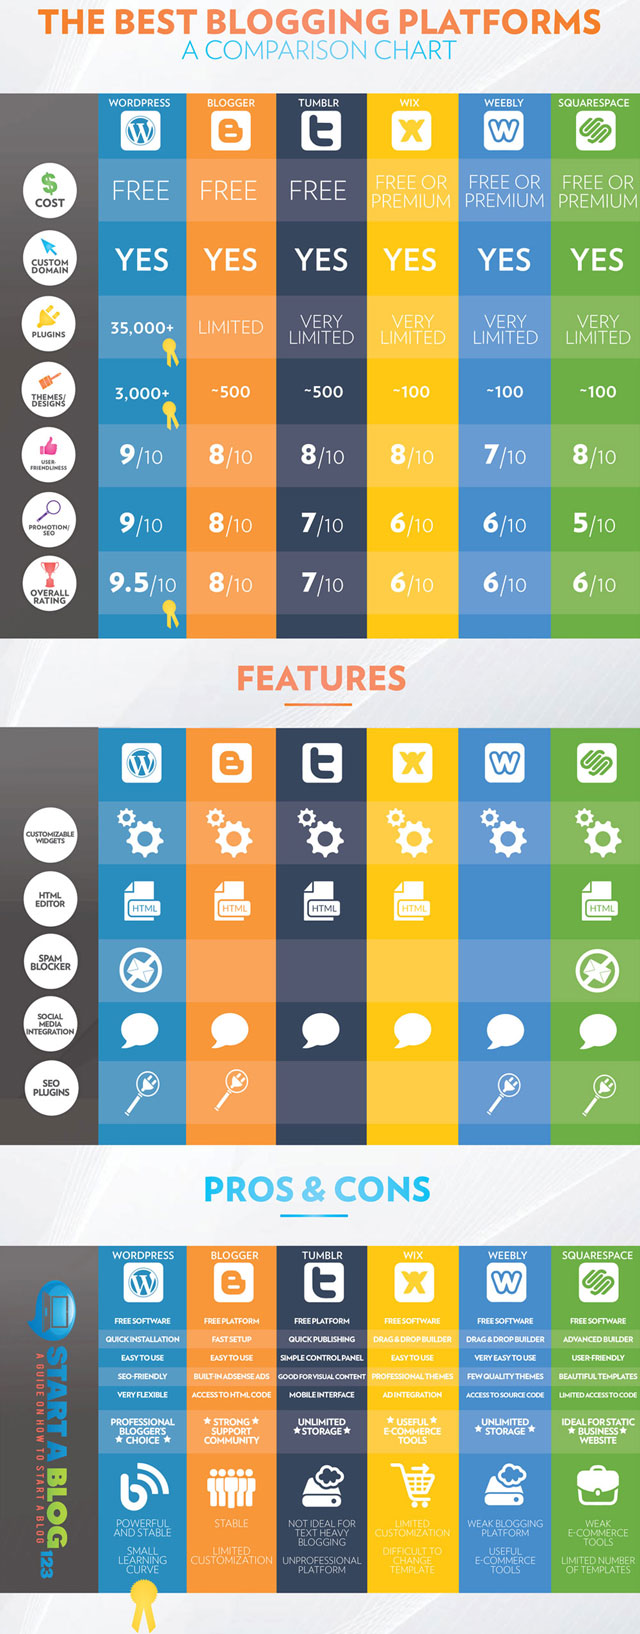 Best Blogging Platforms - INFOGRAPHIC